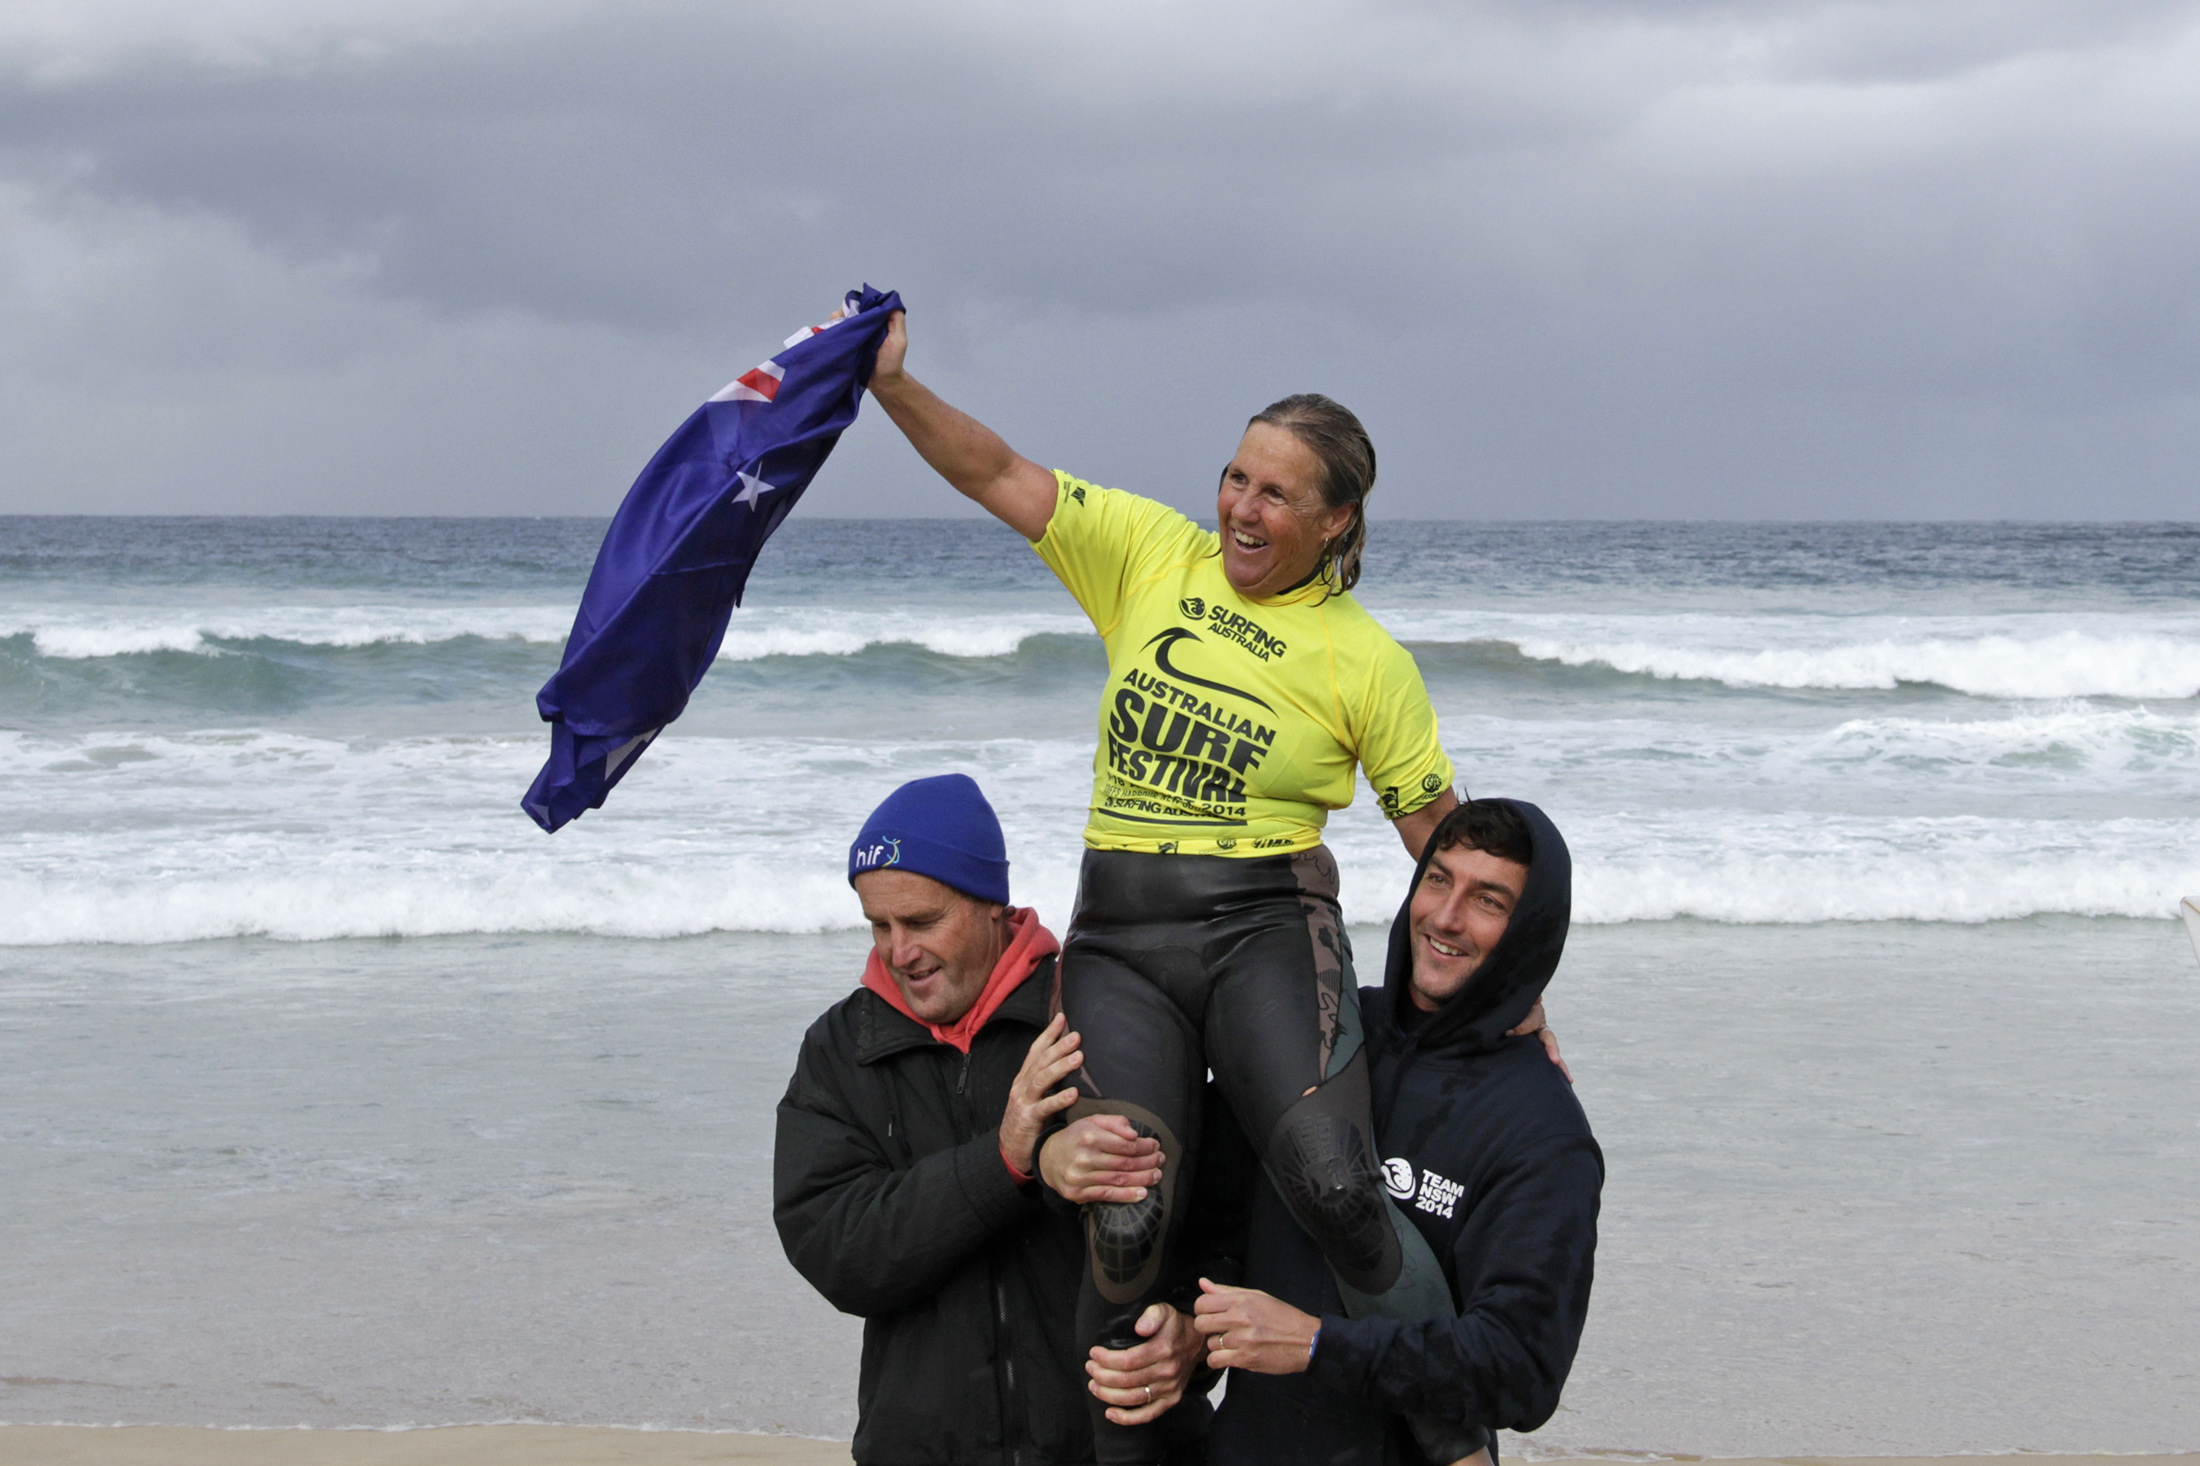 Sandra English Photo: Surfing Australia/Smith